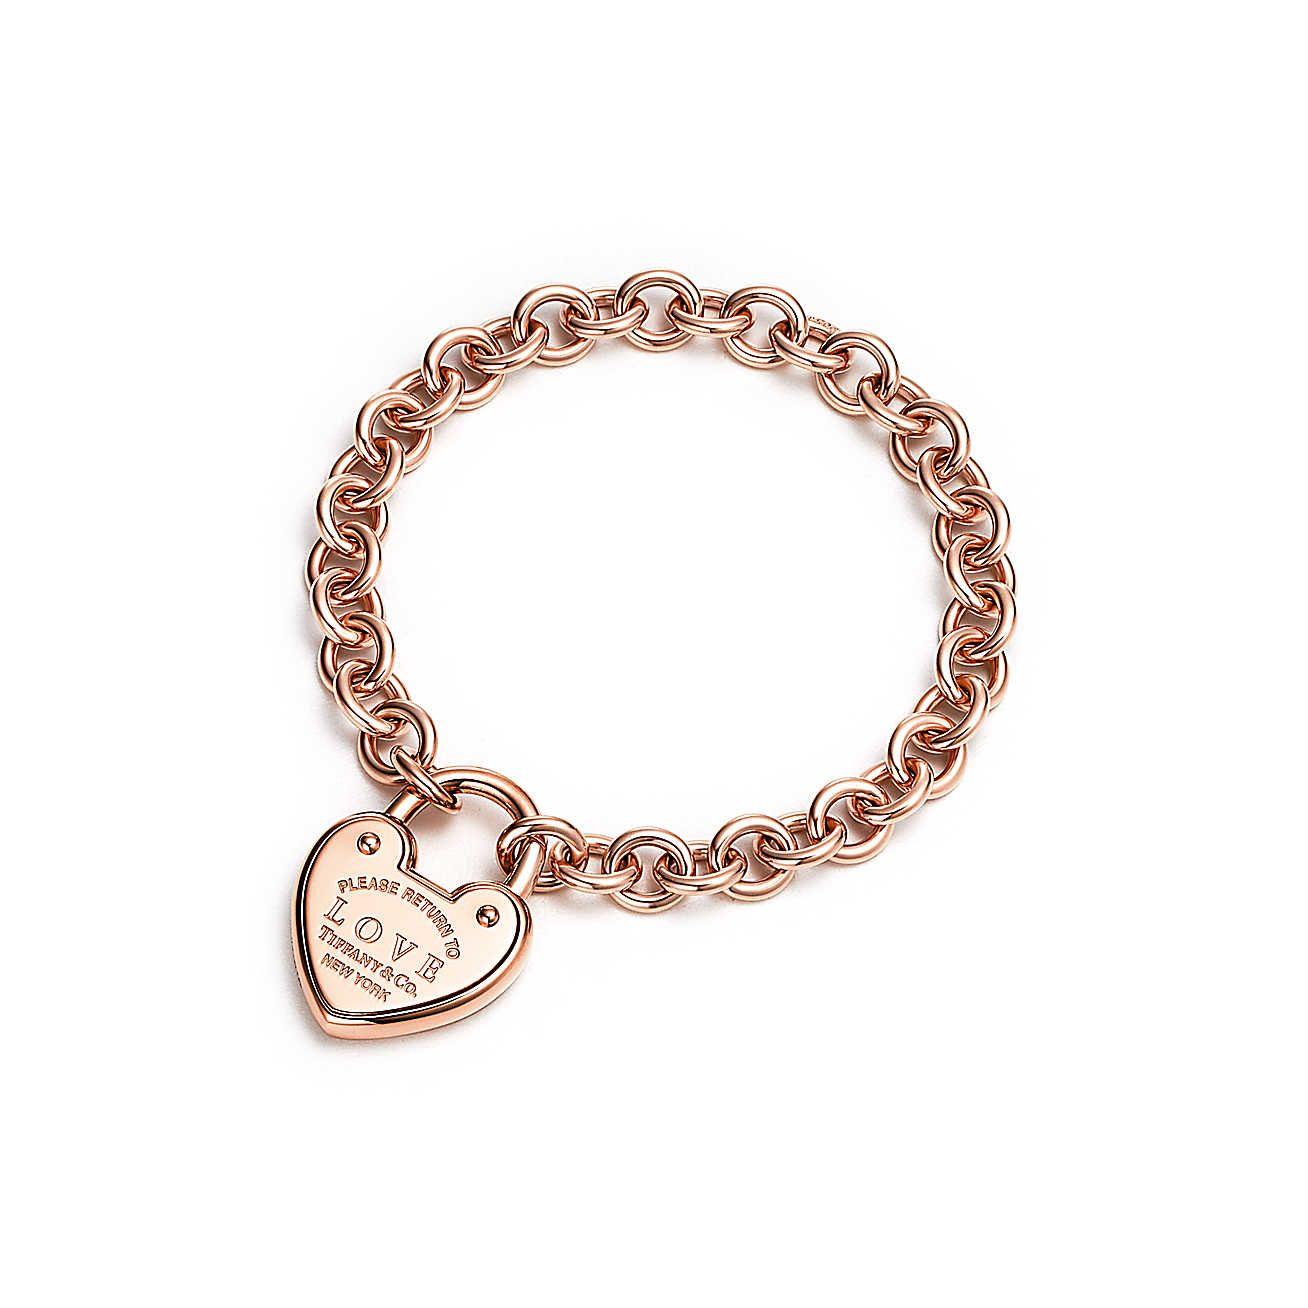 Bracelets for Women: Bangles, Cuffs & More